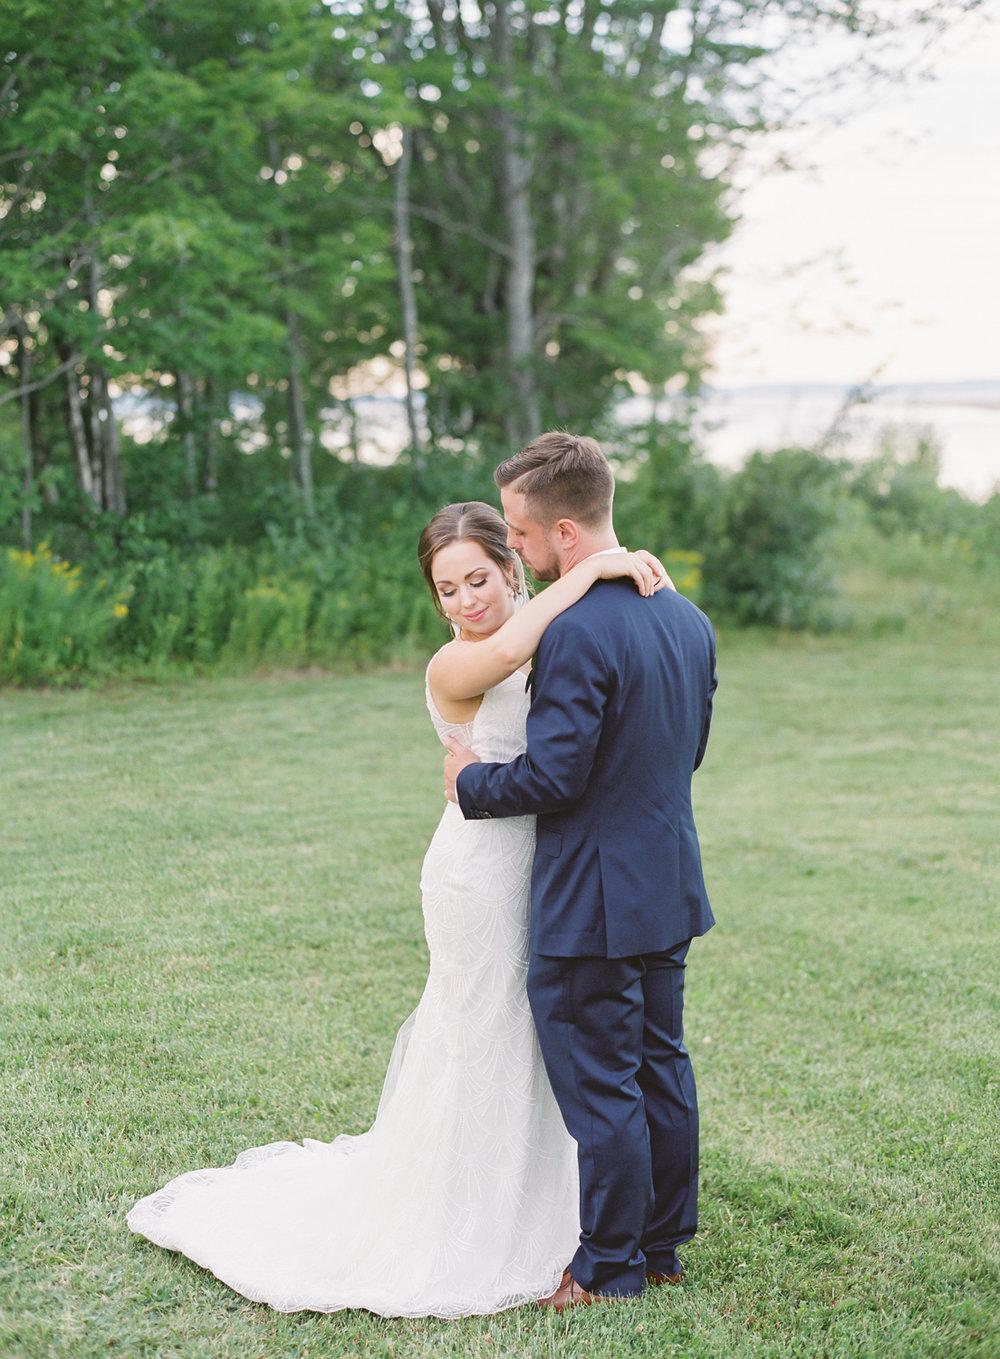 Jacqueline Anne Photography - Nova Scotia Backyard Wedding-86.jpg